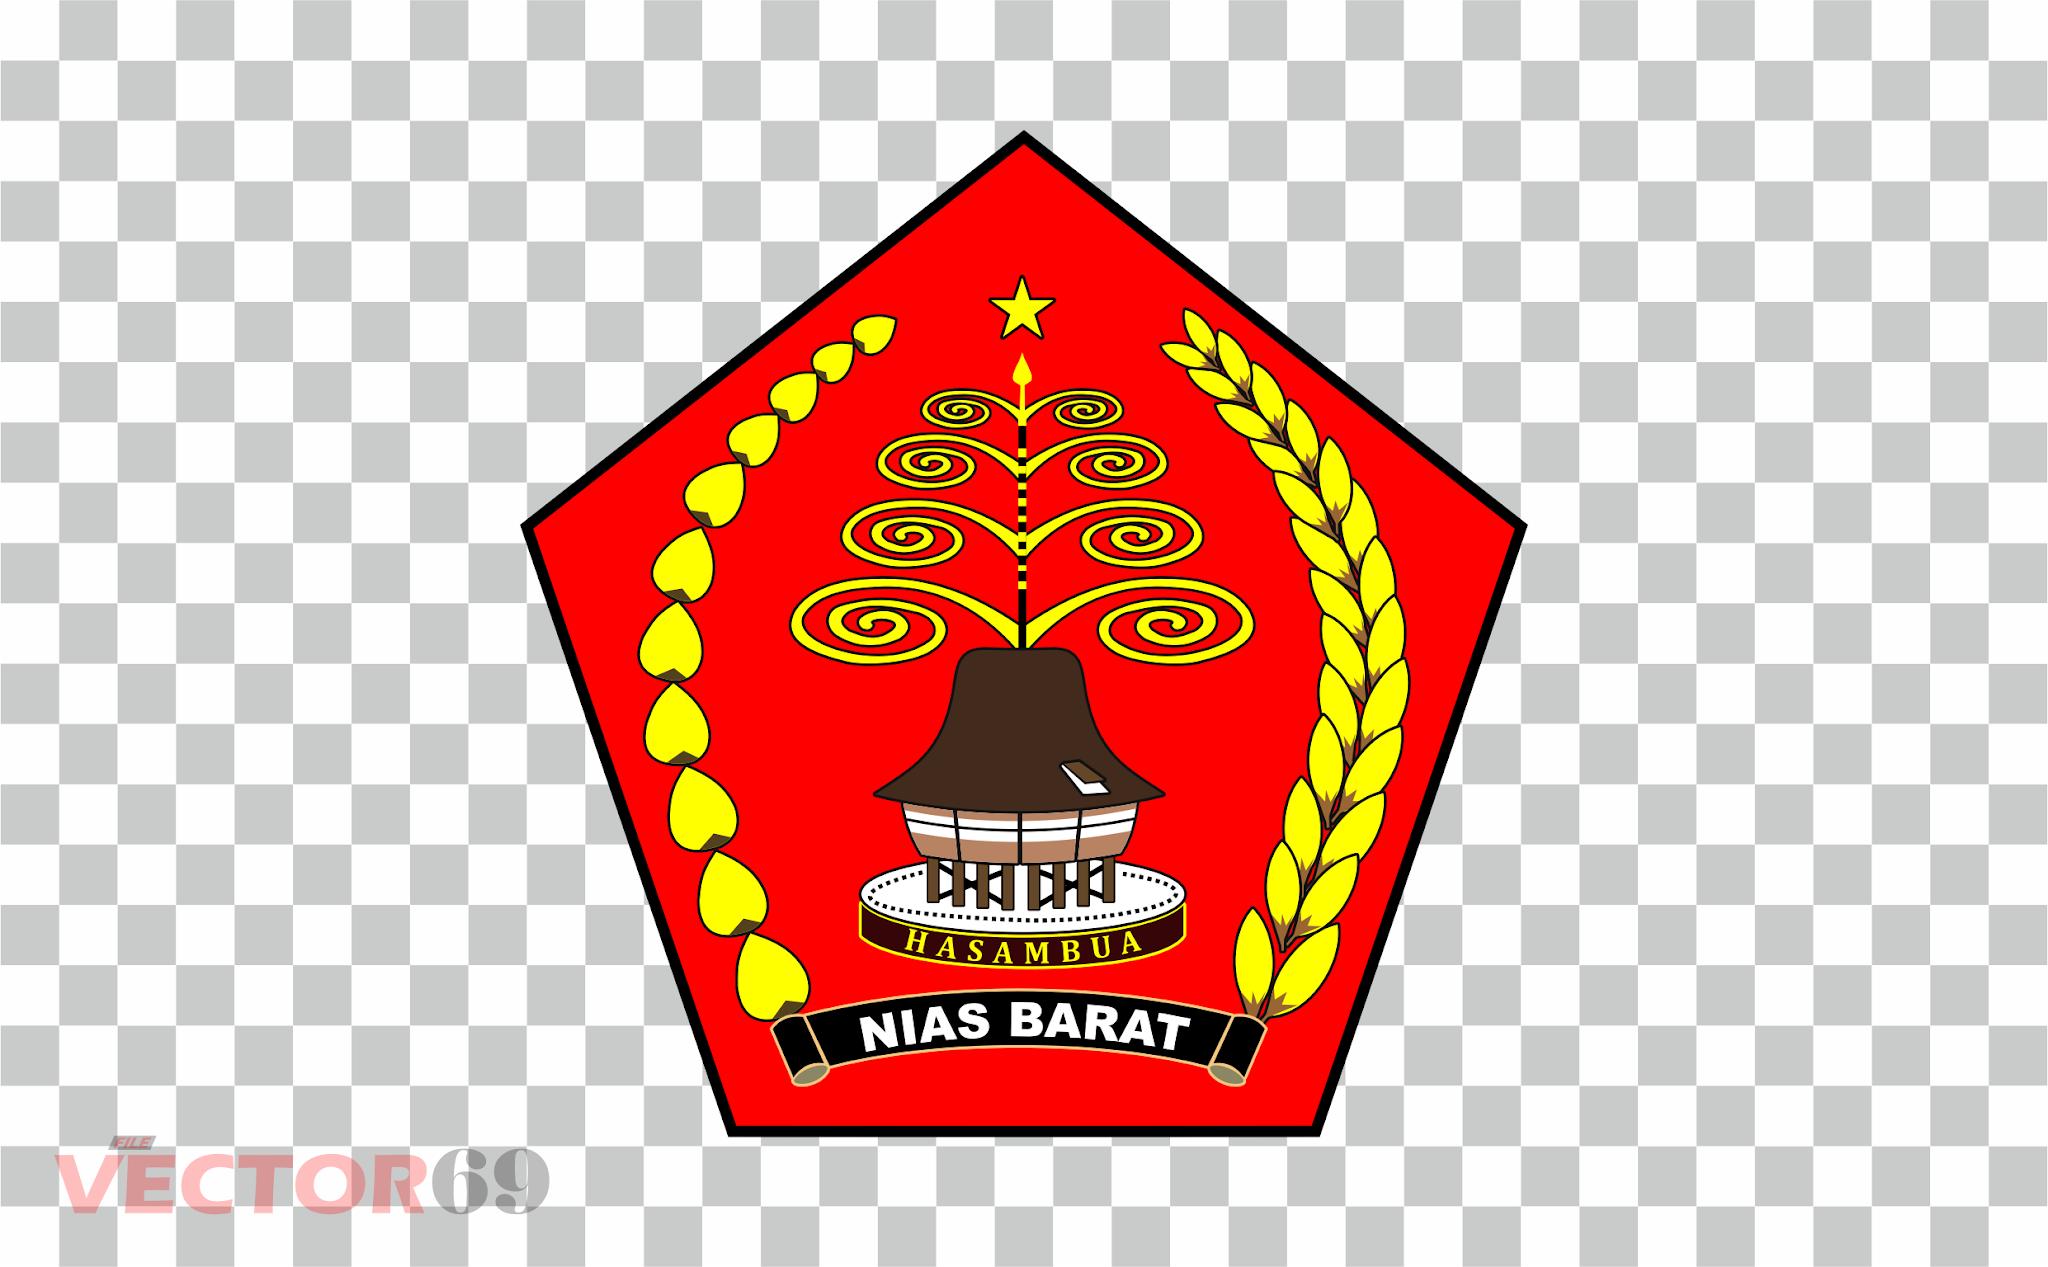 Kabupaten Nias Barat Logo - Download Vector File PNG (Portable Network Graphics)